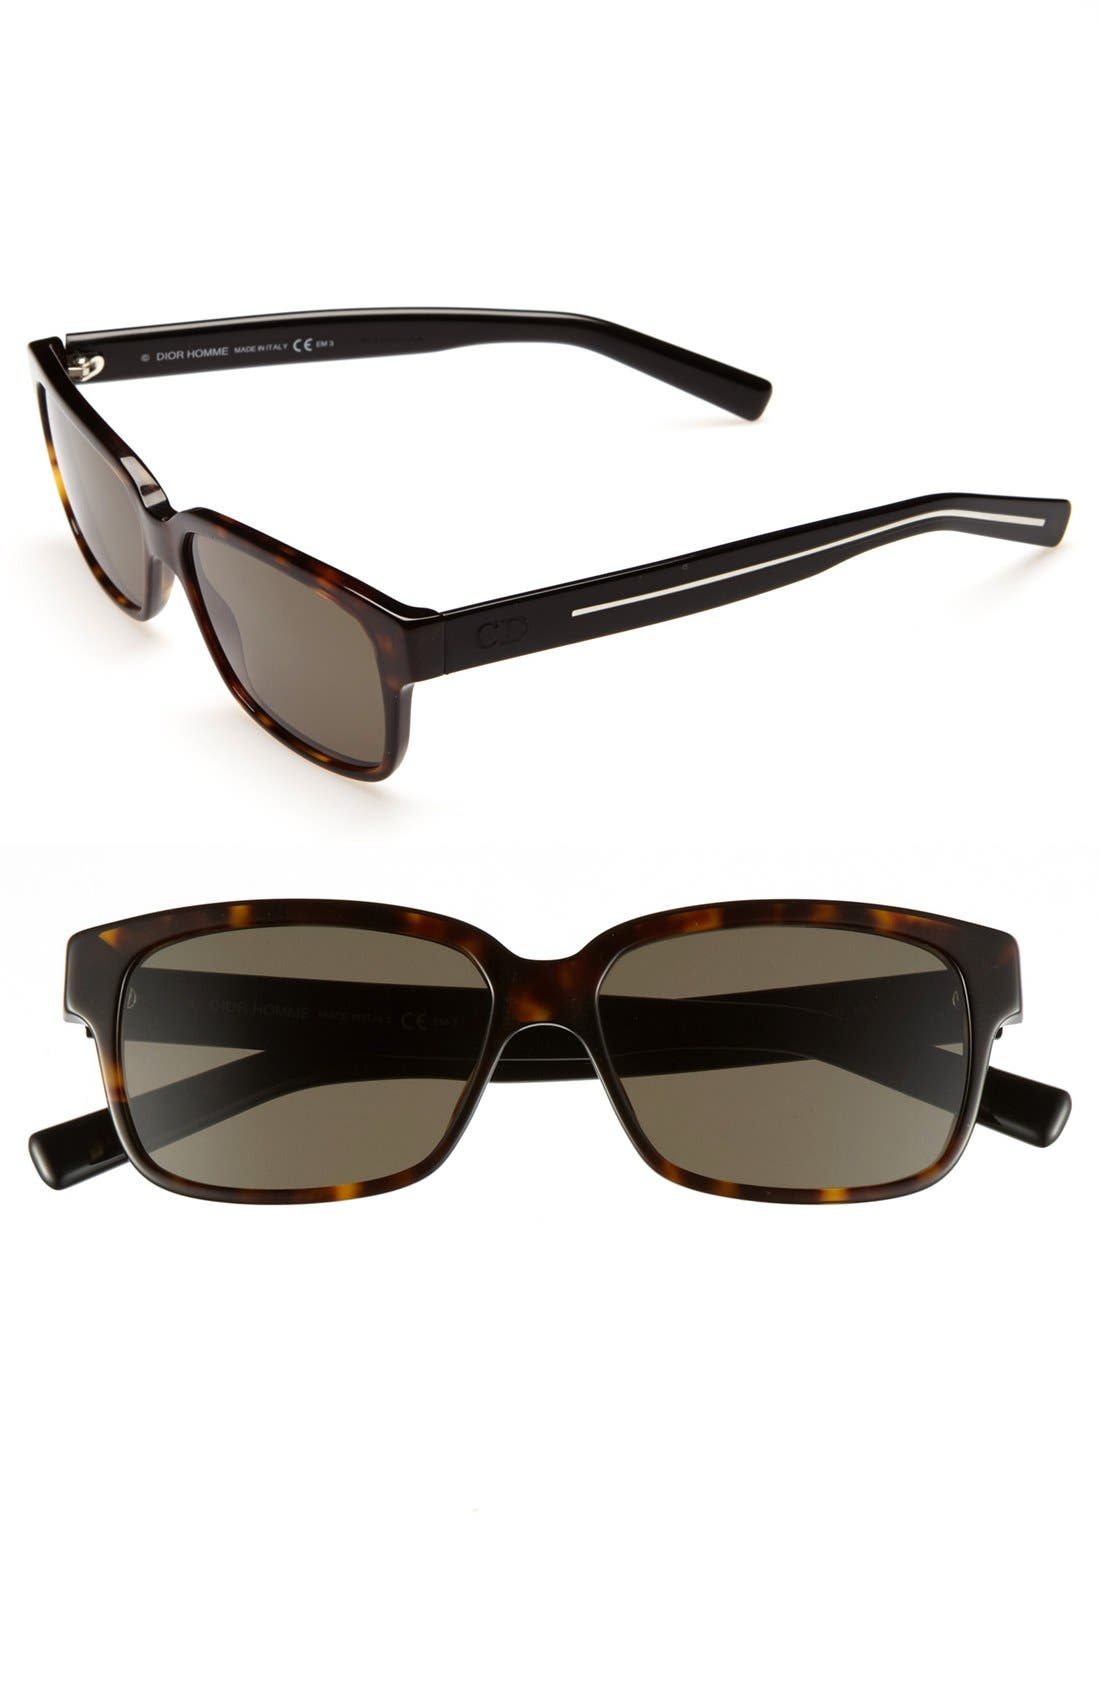 Main Image - Christian Dior '148S' 54mm Sunglasses